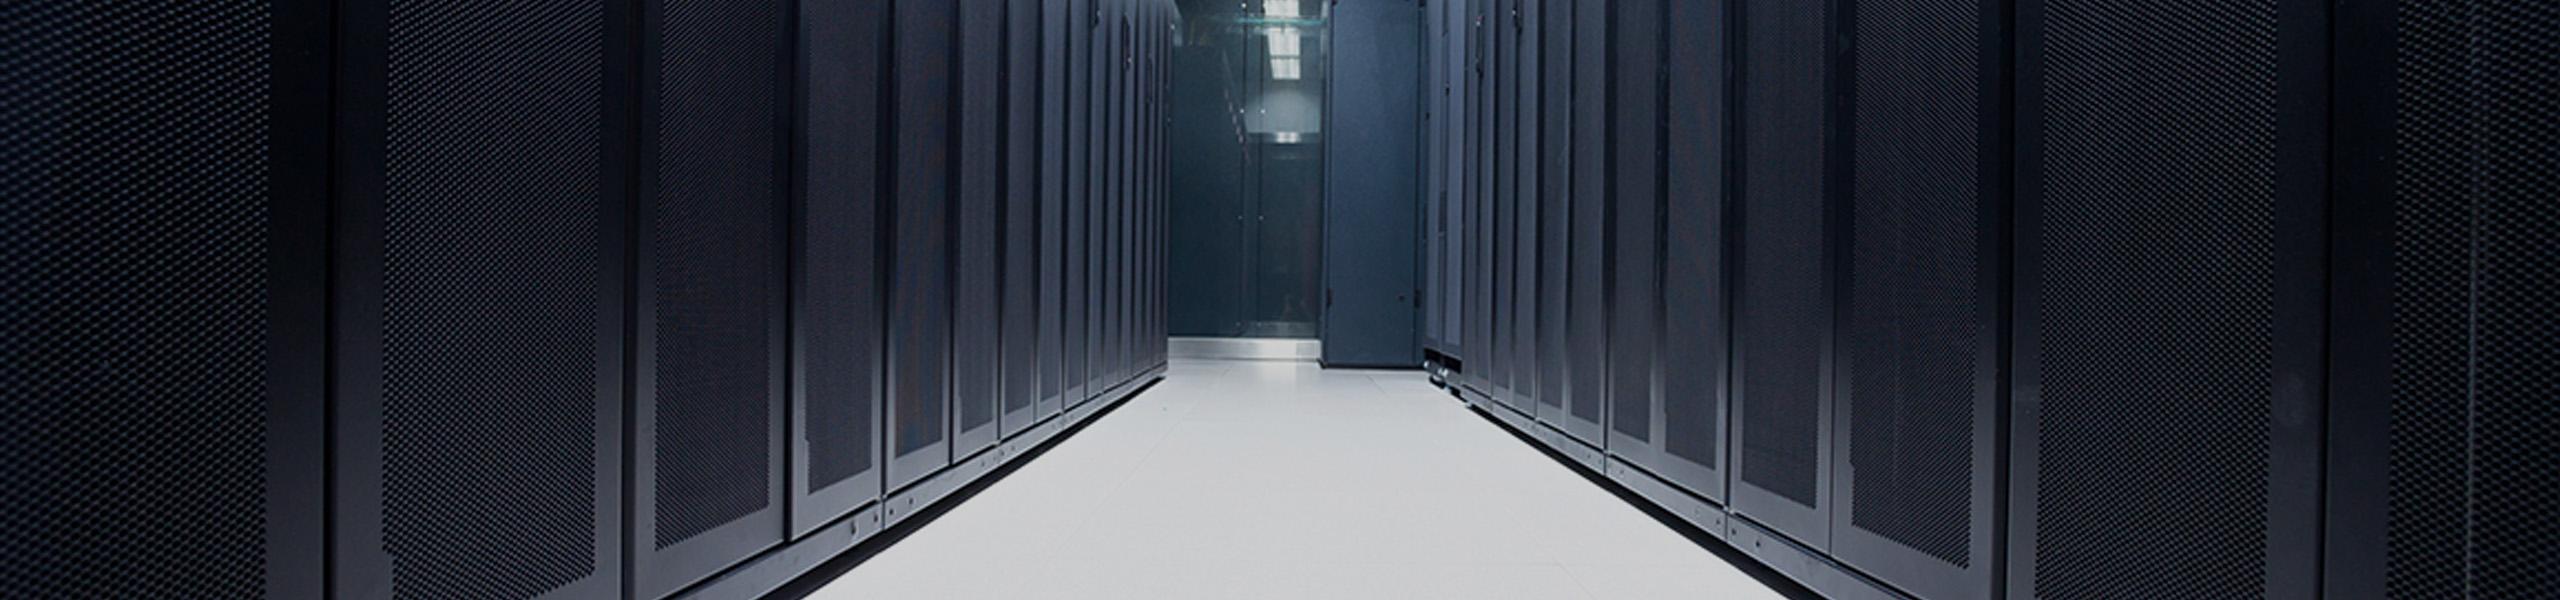 banner_principal_superior_networking_gabinete_para_telecomunicaciones